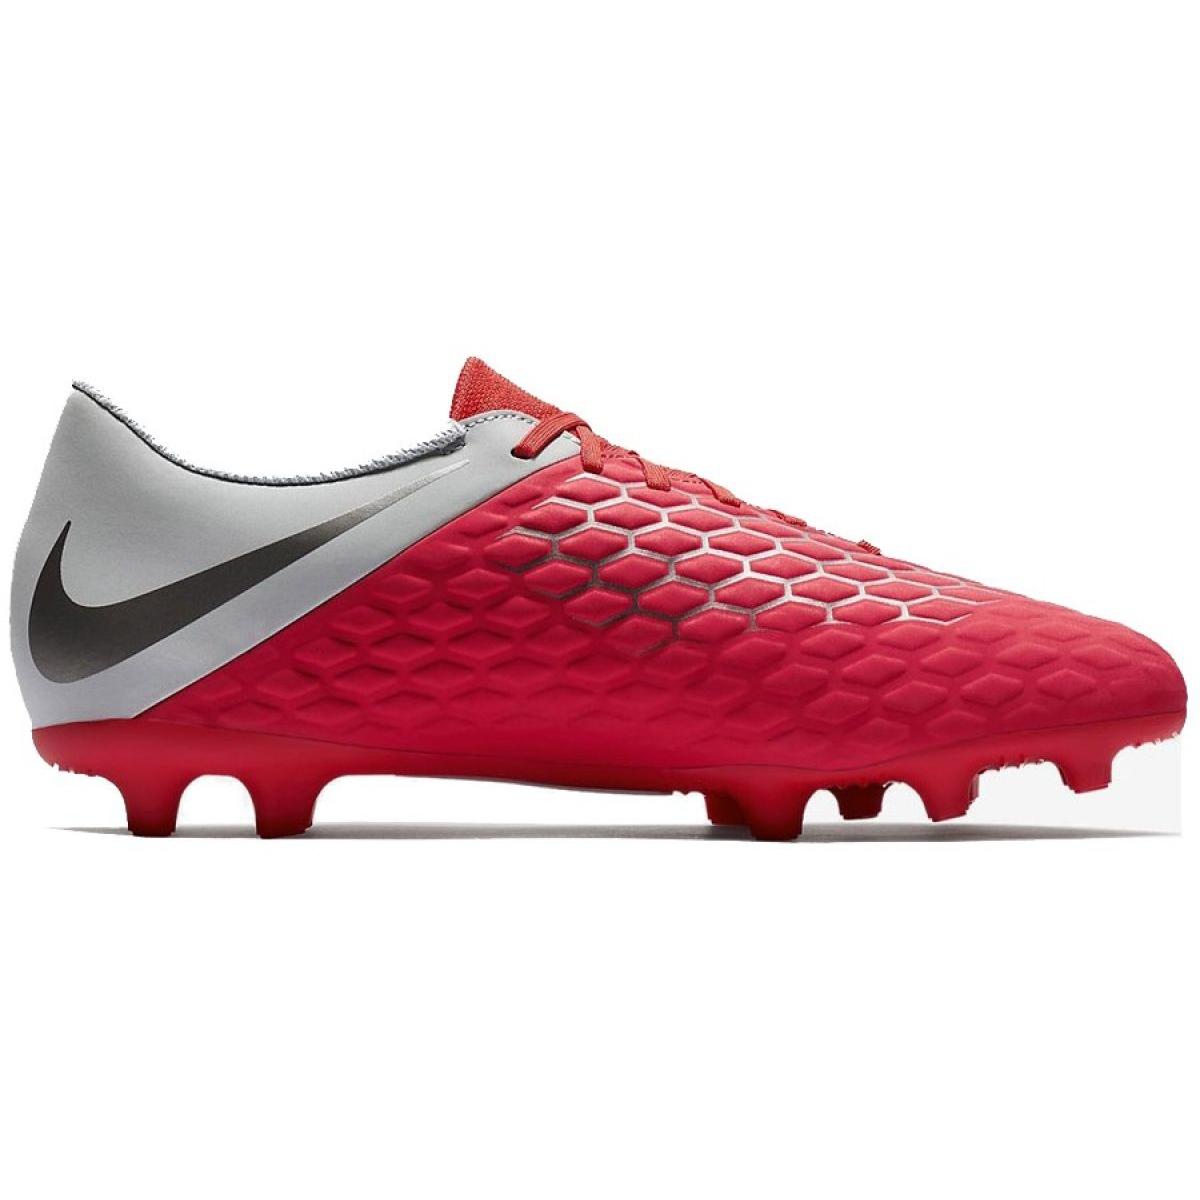 Fußballschuhe Nike Hypervenom Phantom 3 Club Fg 3 M AJ4145-600